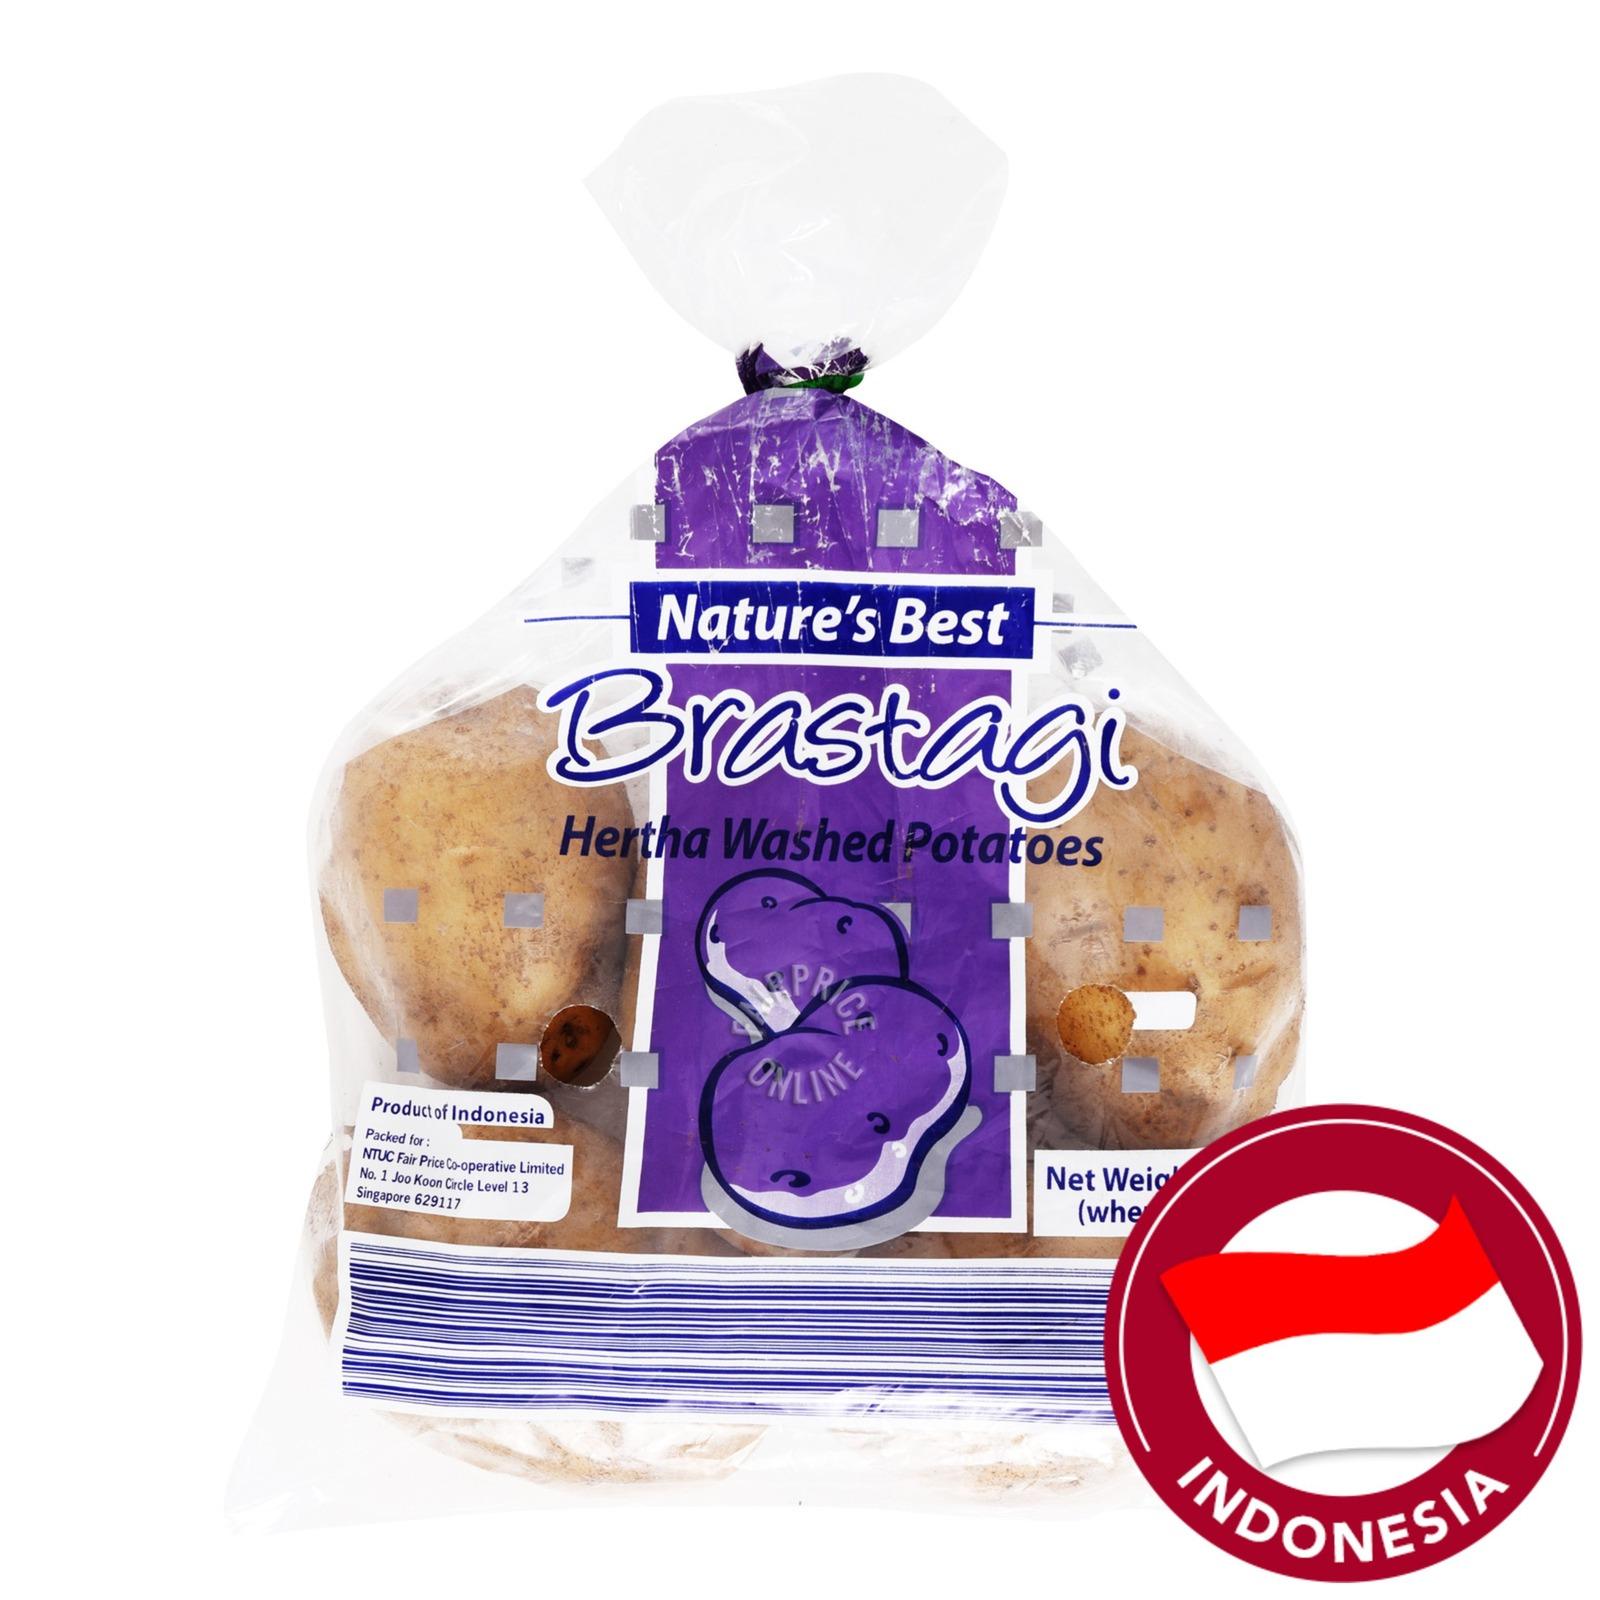 Nature's Best Brastagi Potatoes - Hertha (Washed)